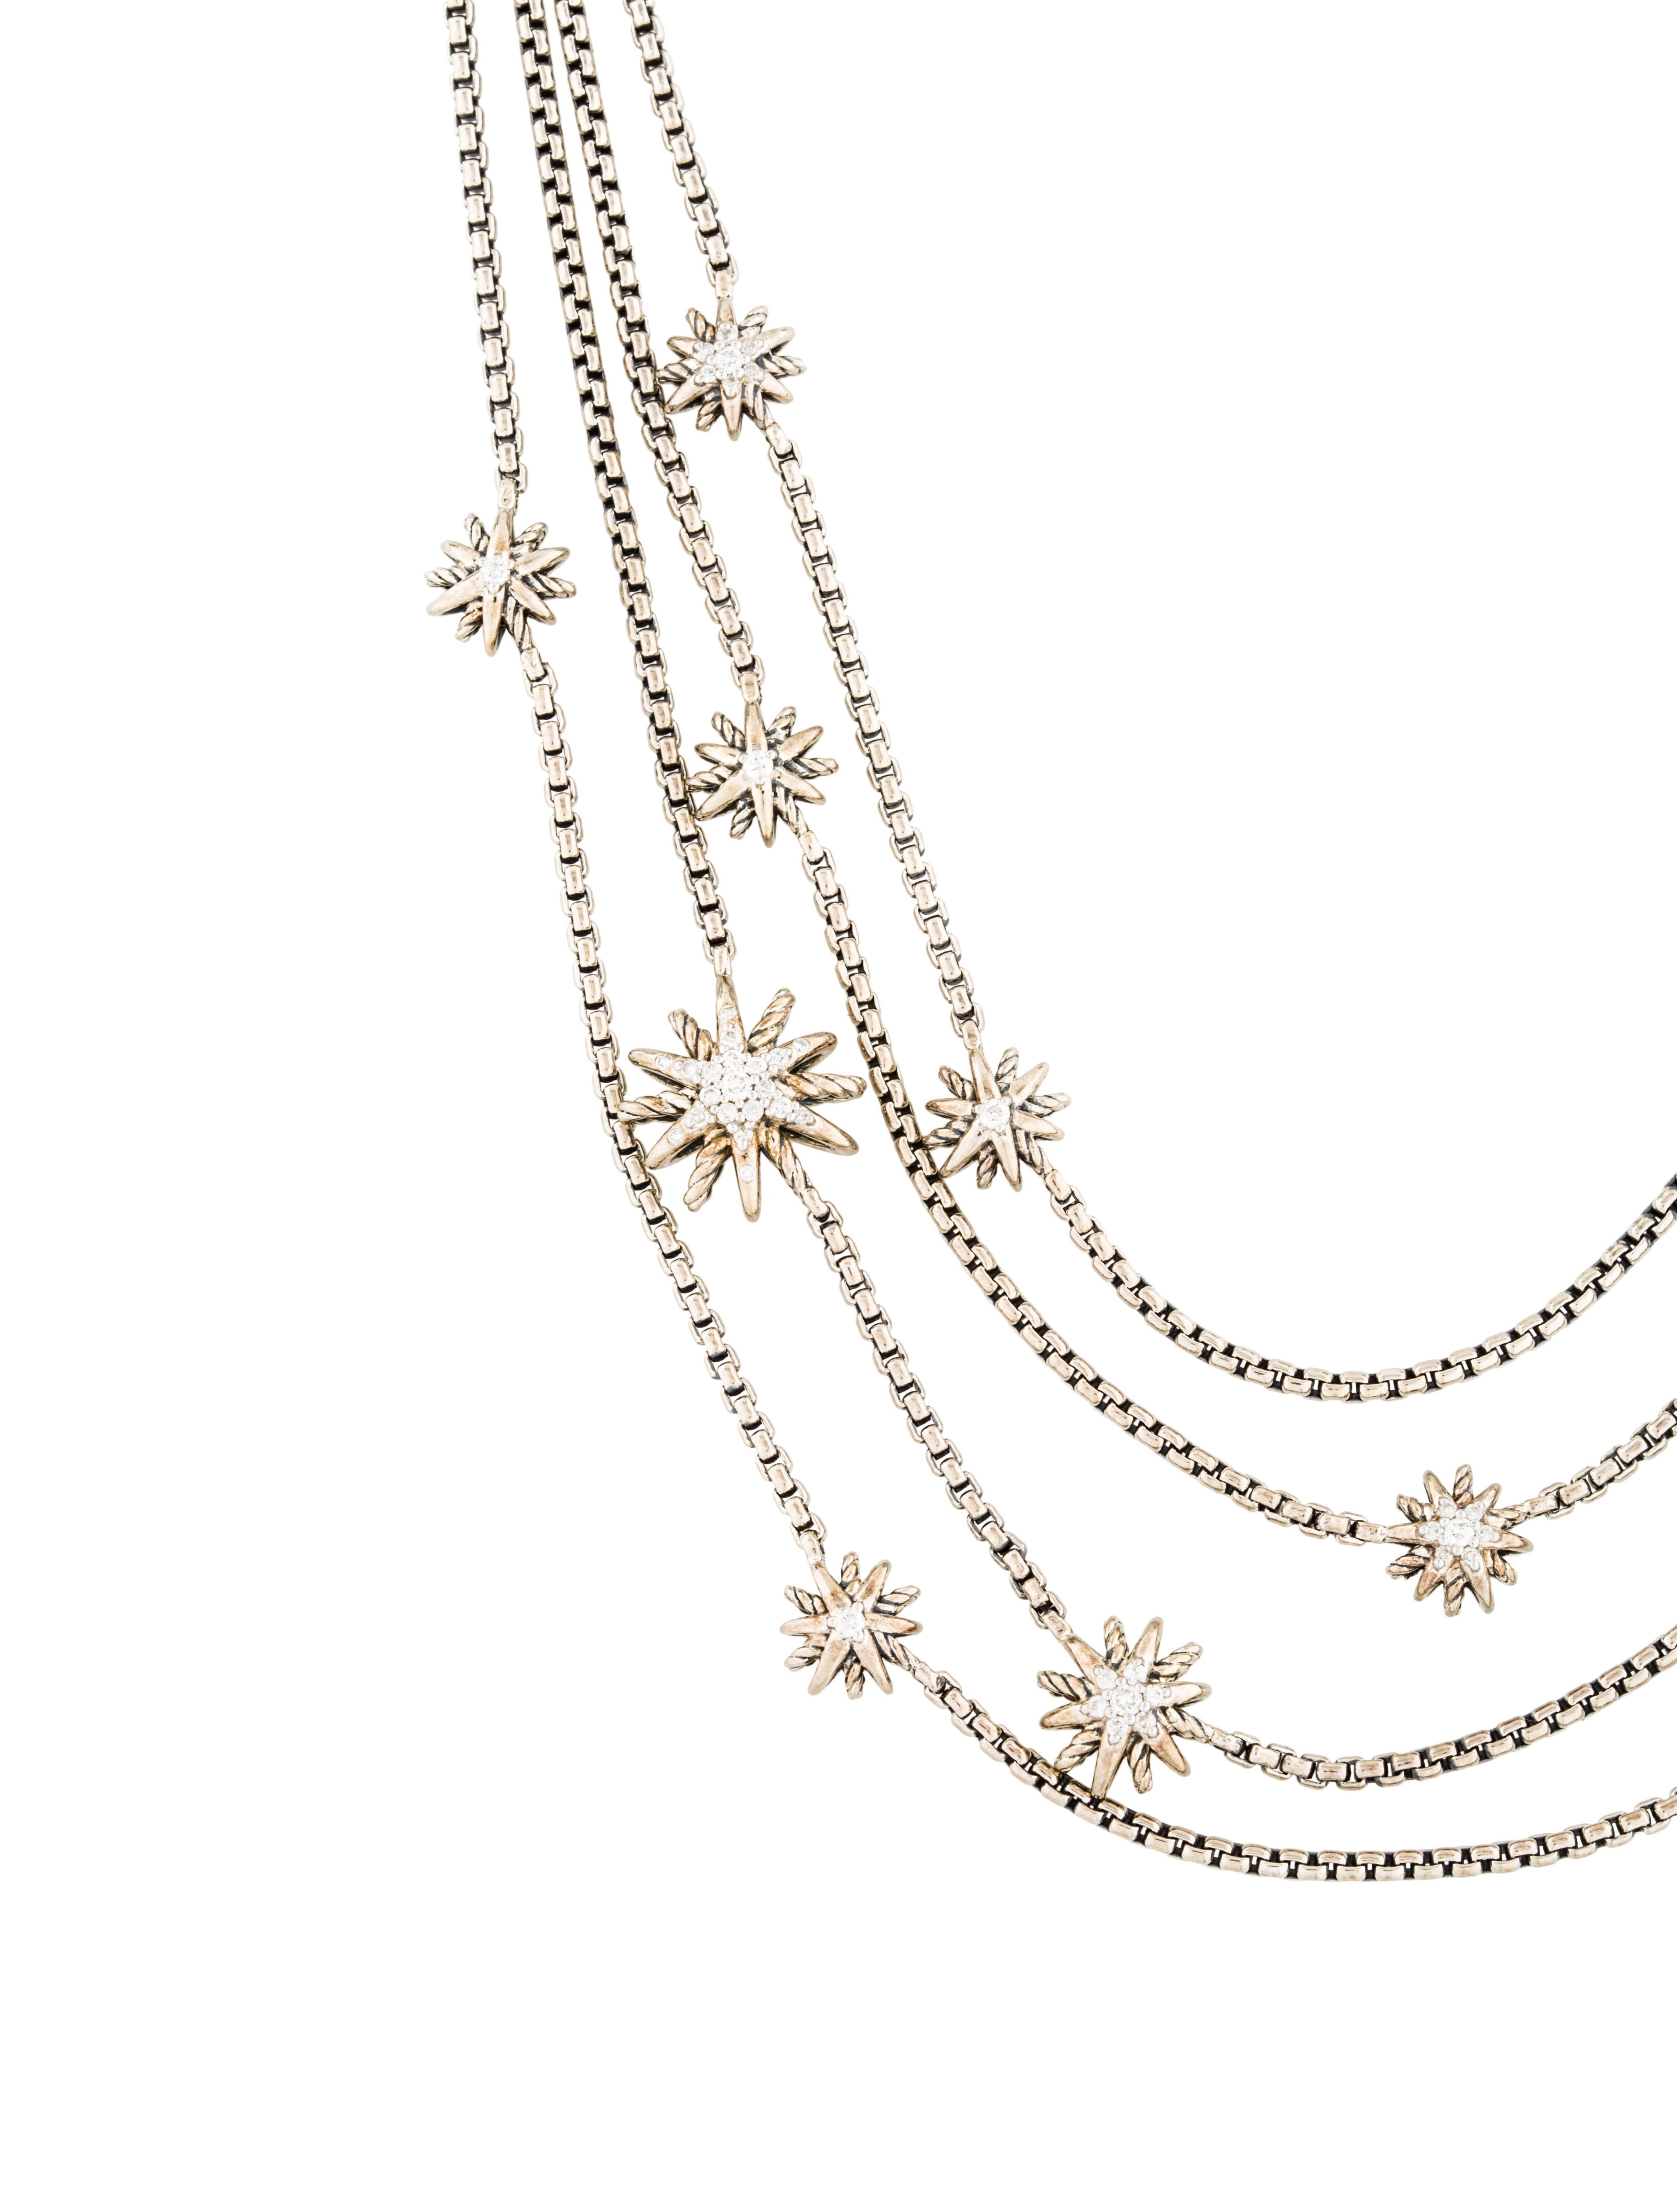 David Yurman Diamond Starburst Multistrand Necklace